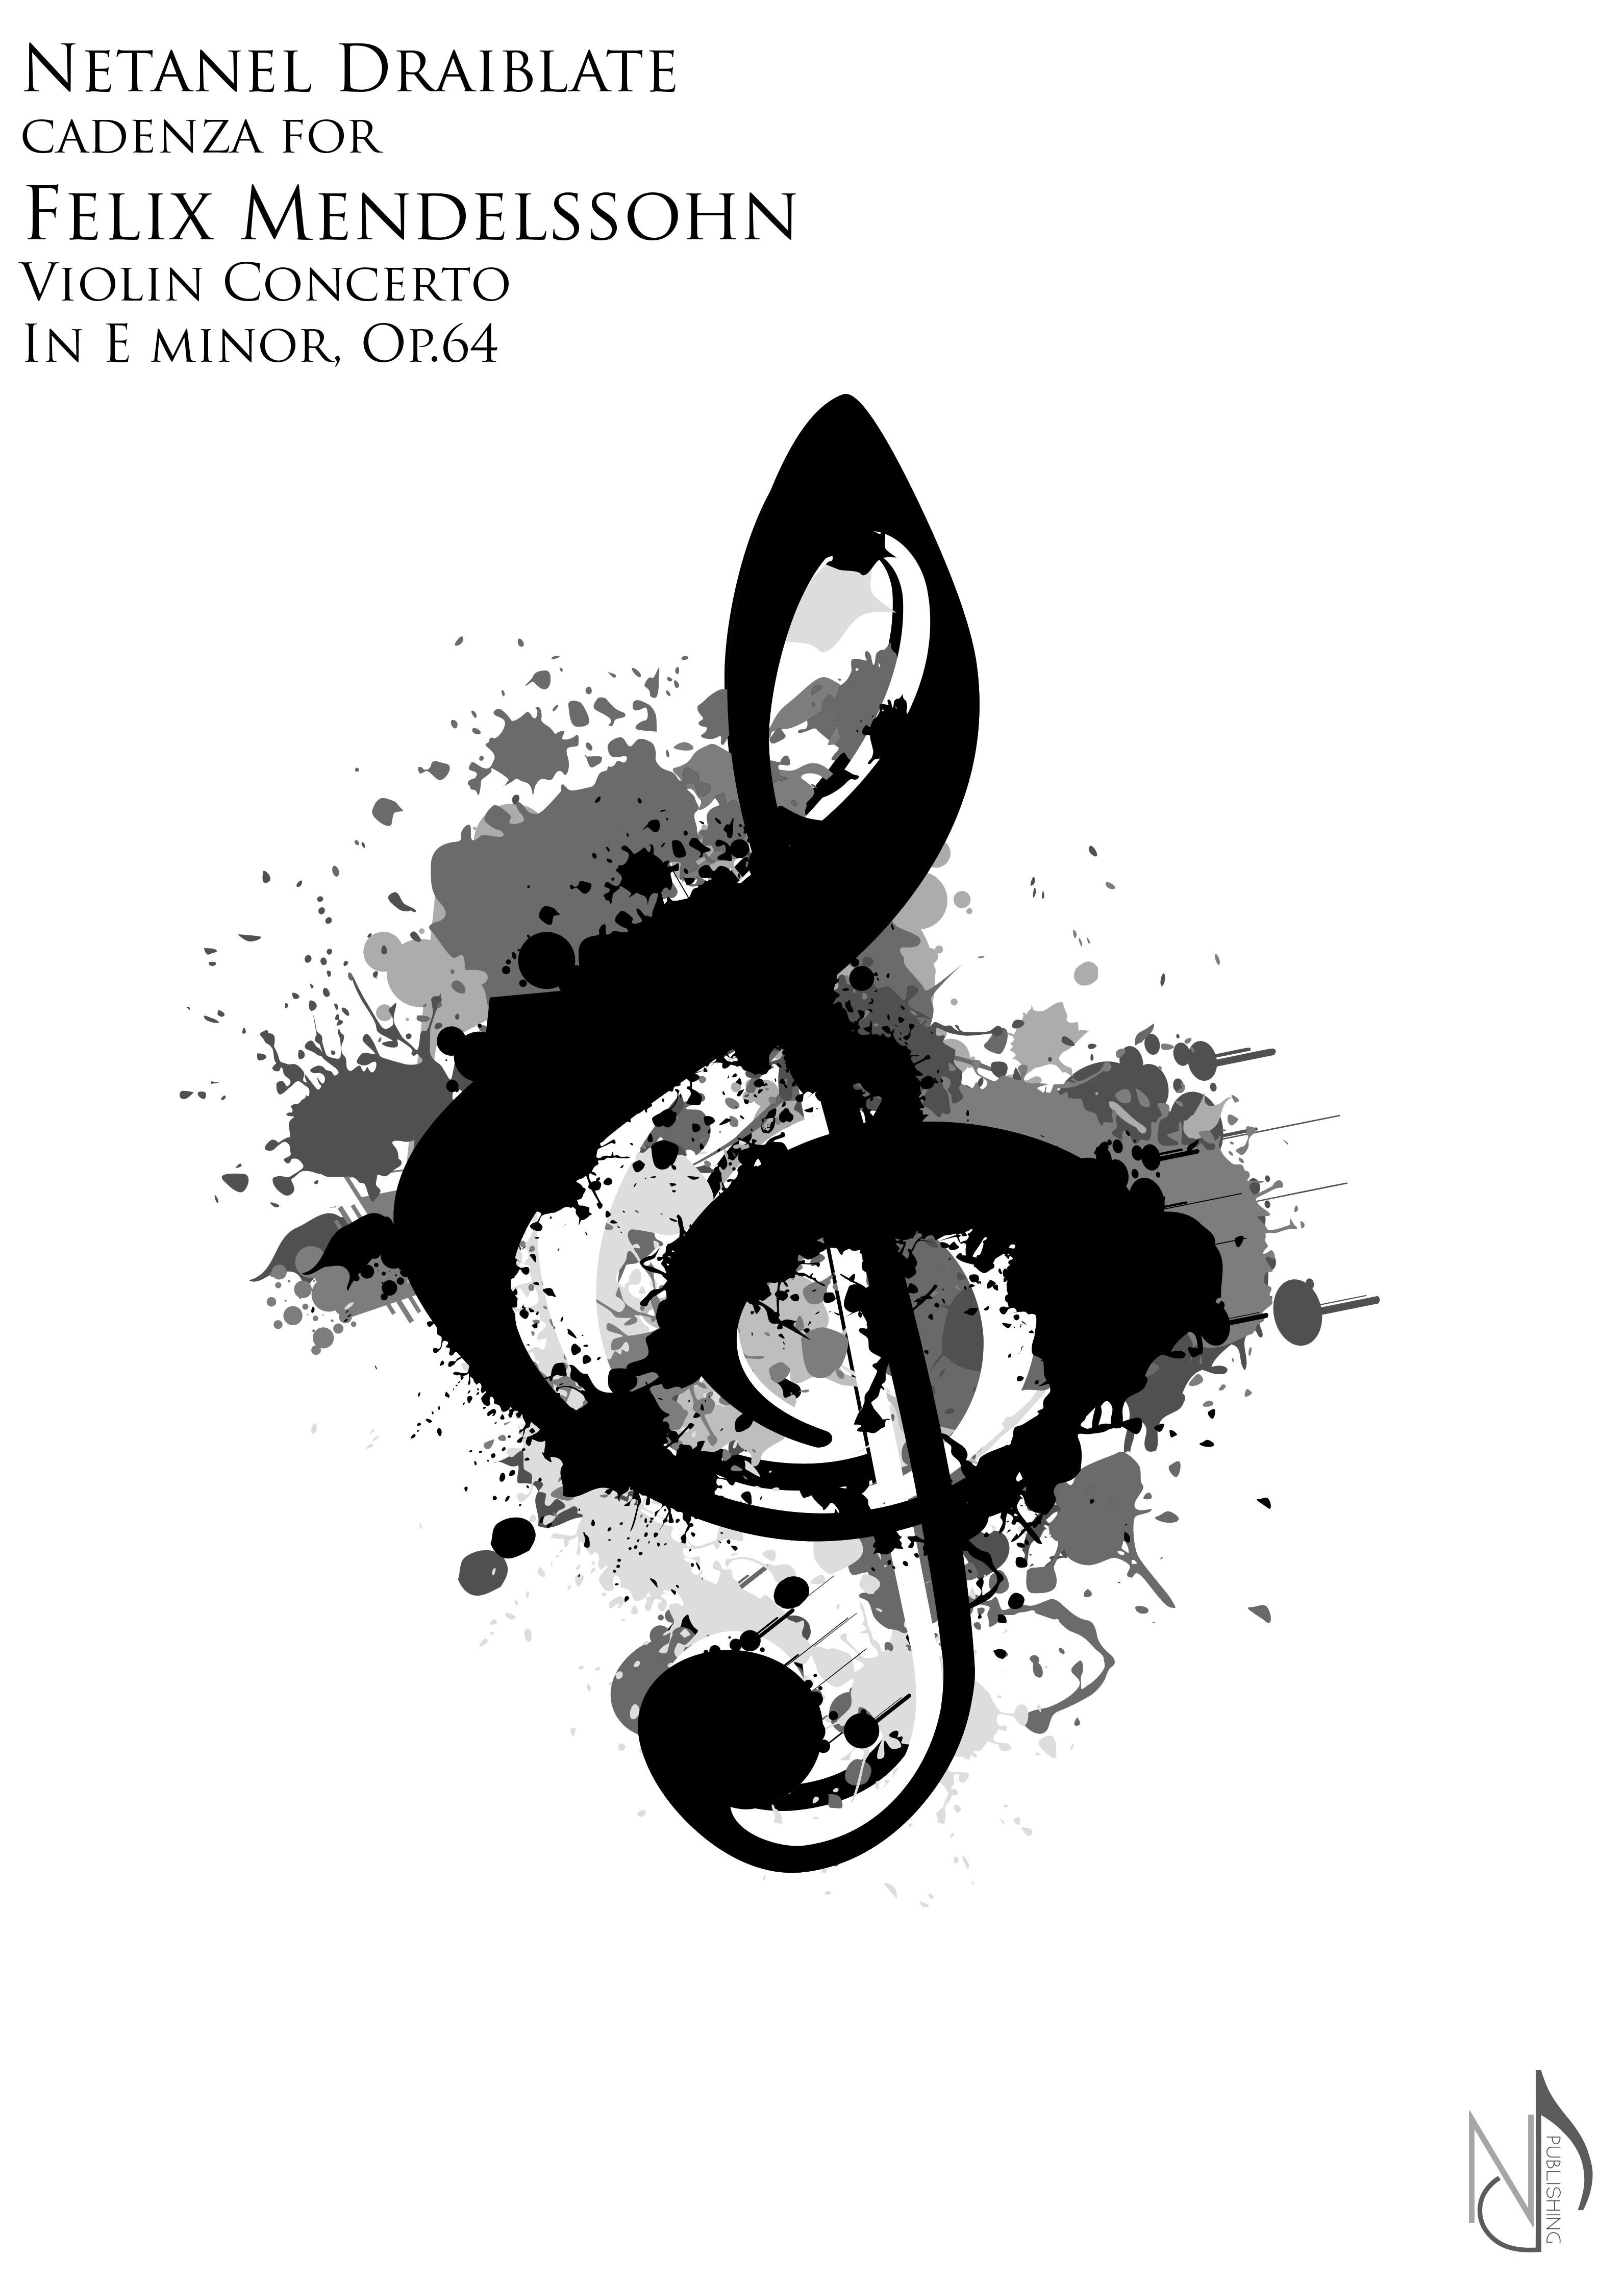 Mendelssohn Concerto Cadenza